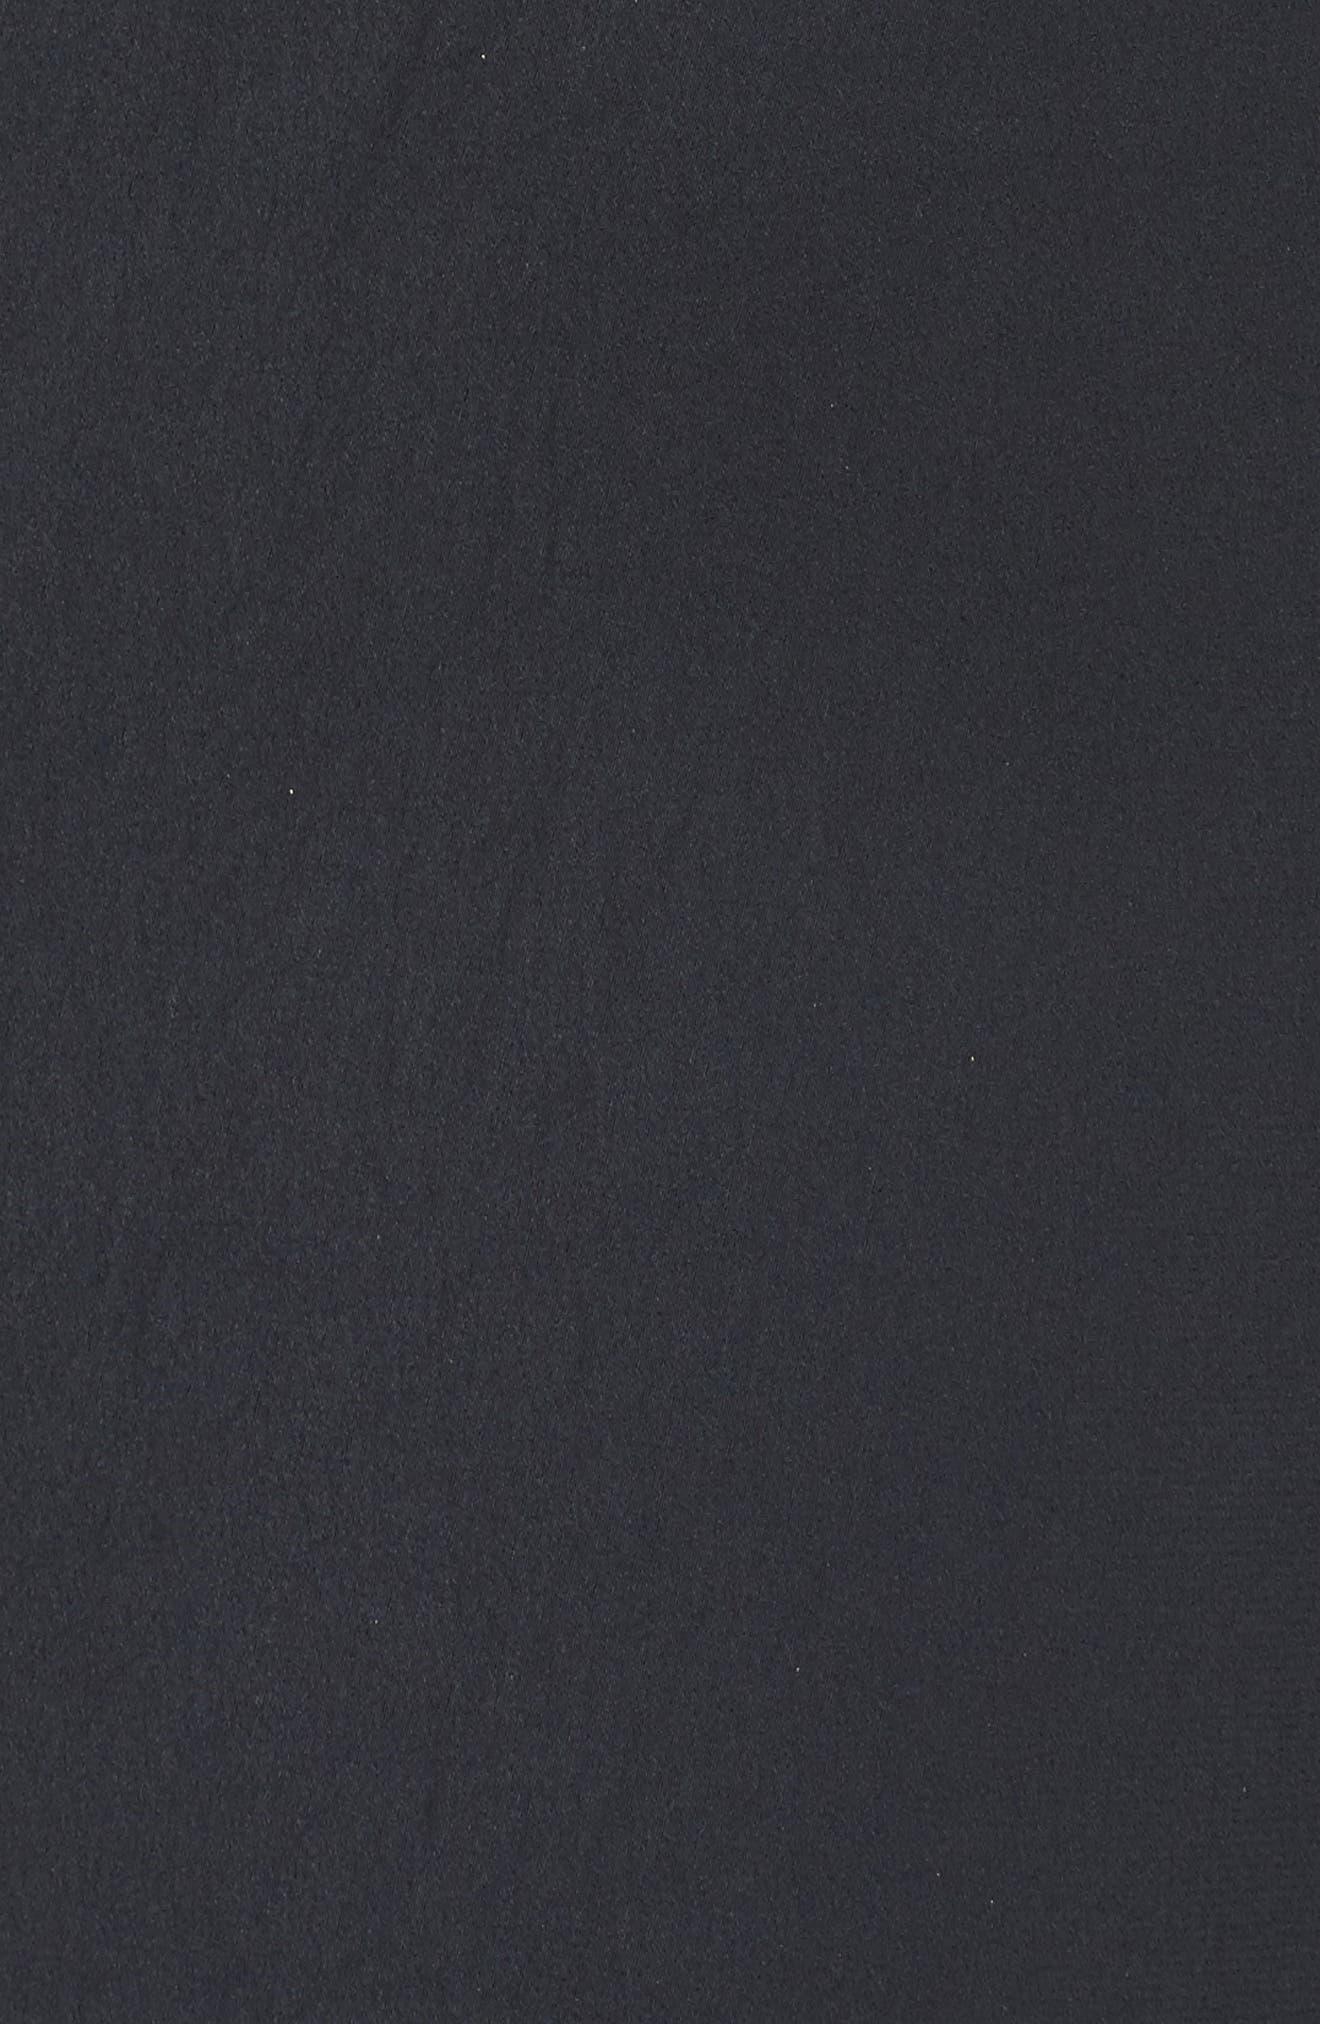 Ruffle Sleeve Satin Dress,                             Alternate thumbnail 5, color,                             001